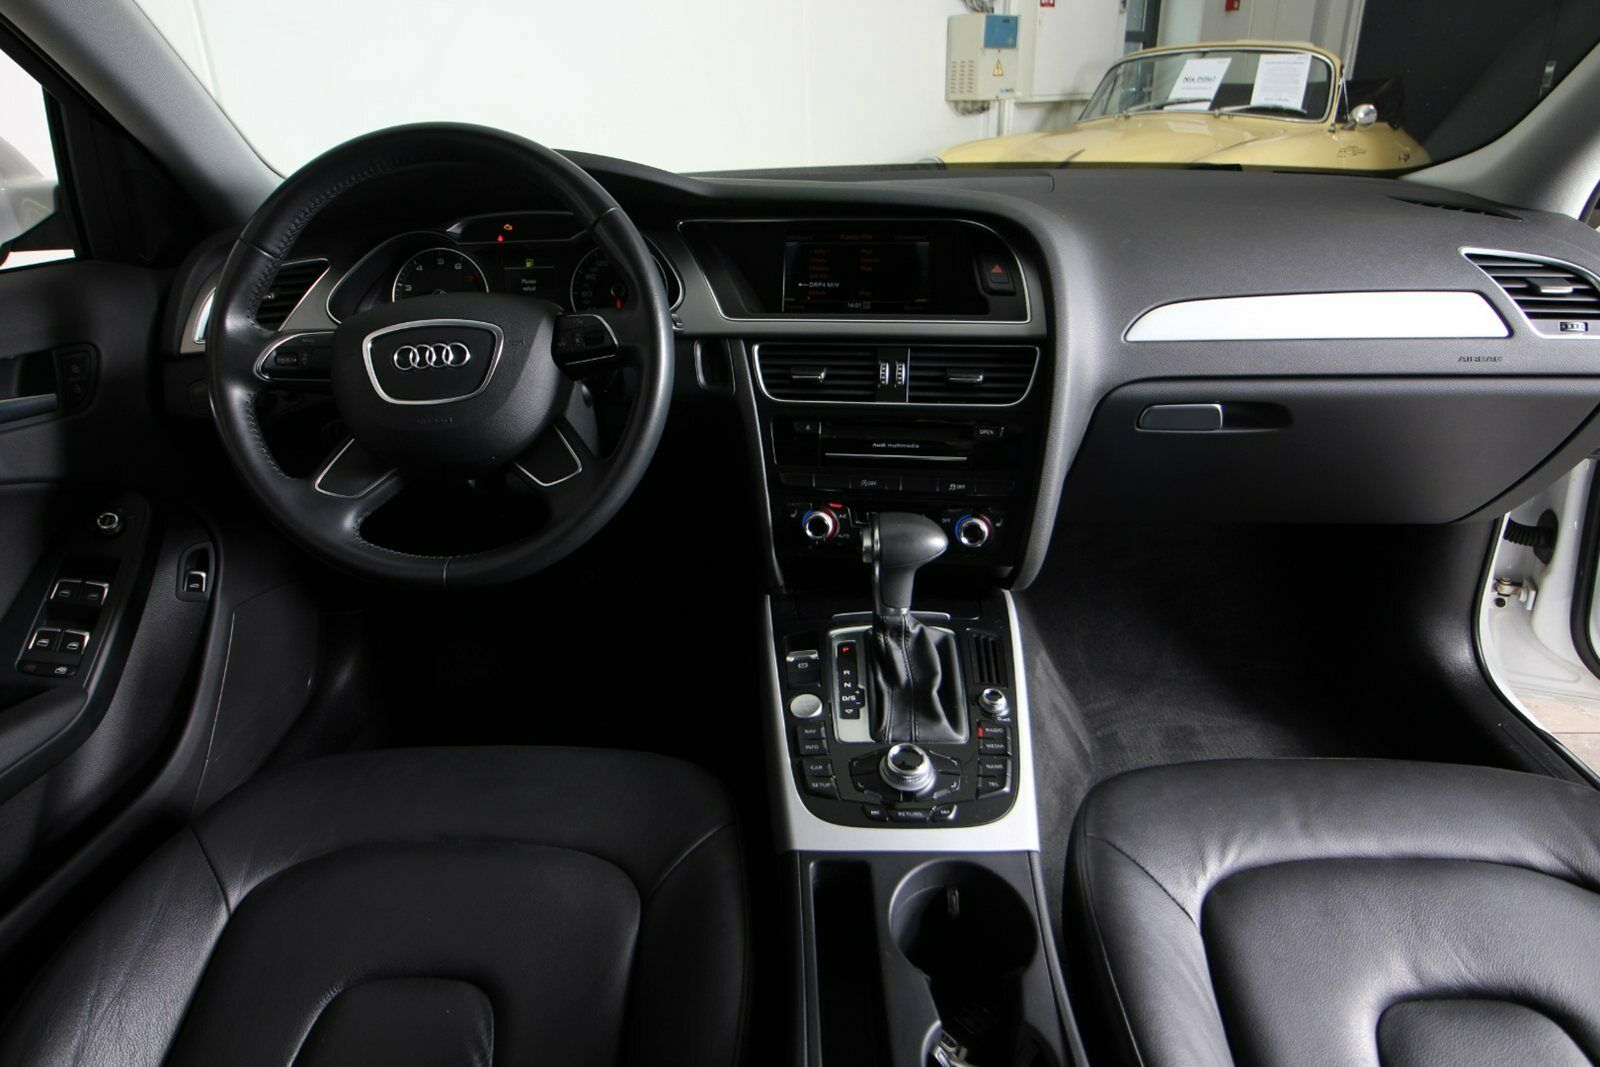 Audi A4 TFSi 120 Multitr.